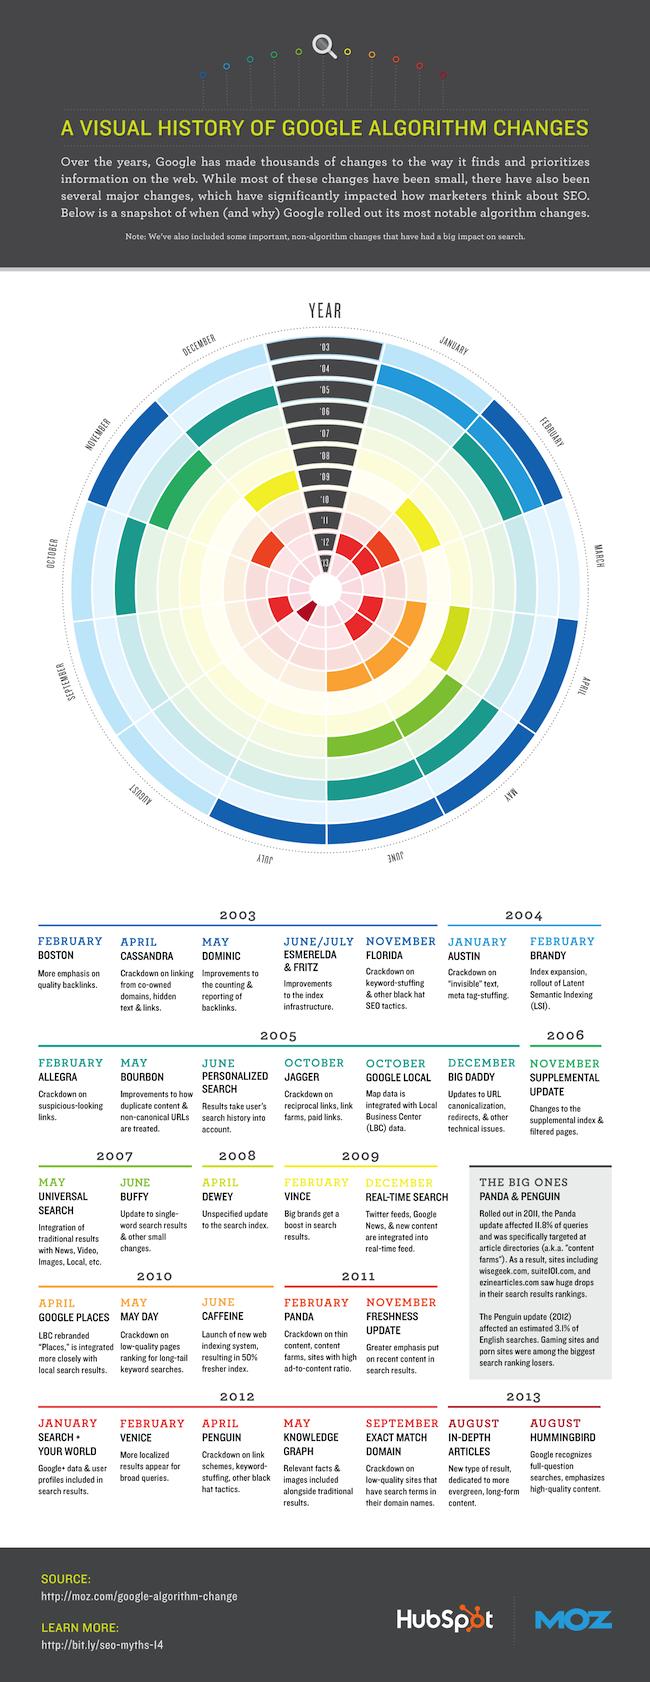 Timeline Infographic of Google Algorithm Changes